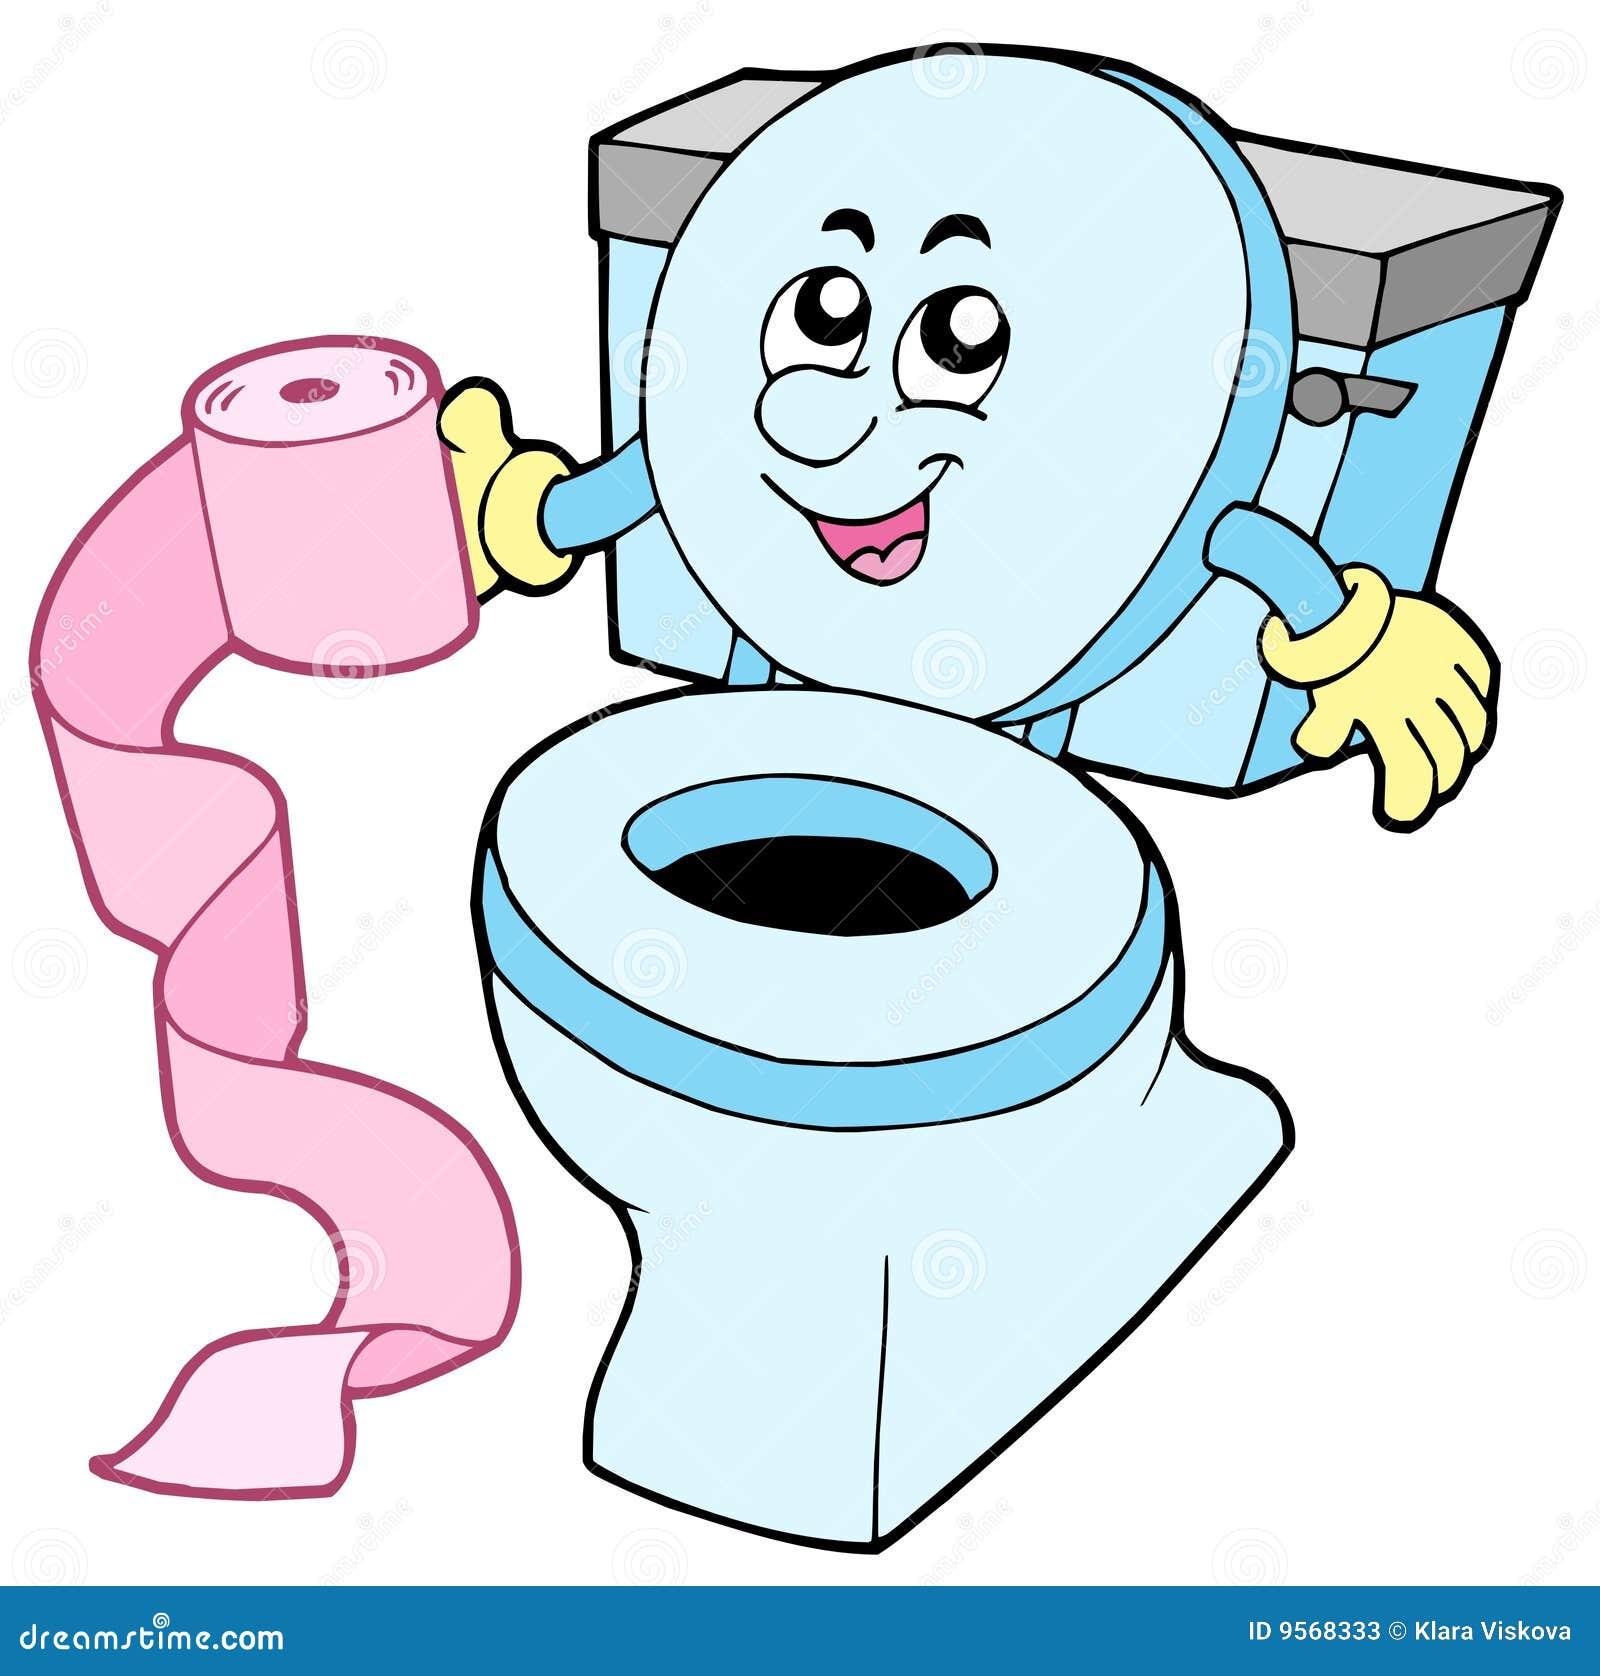 toilette de dessin anim photos stock image 9568333. Black Bedroom Furniture Sets. Home Design Ideas